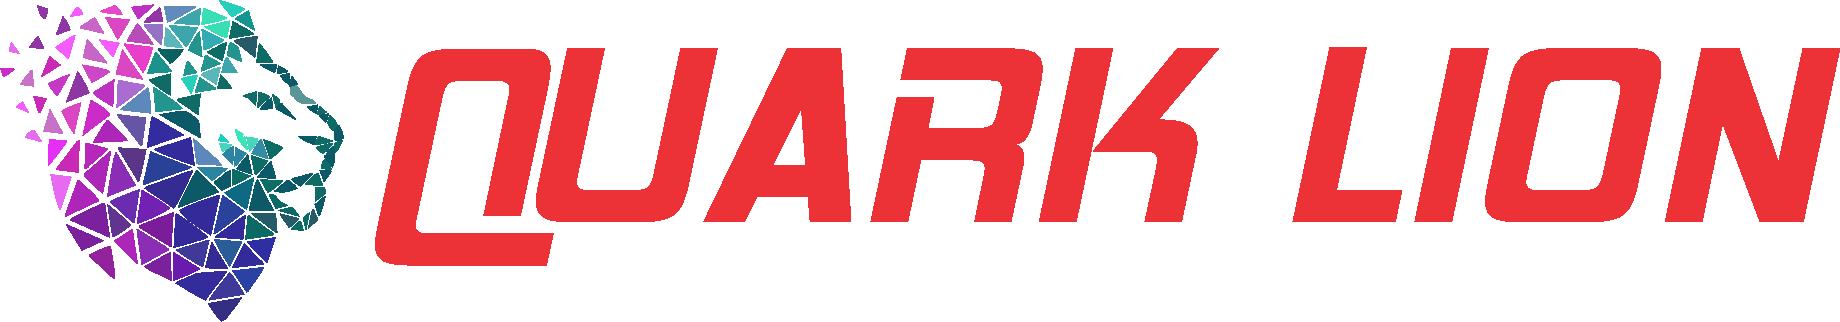 QUARK LION LLC